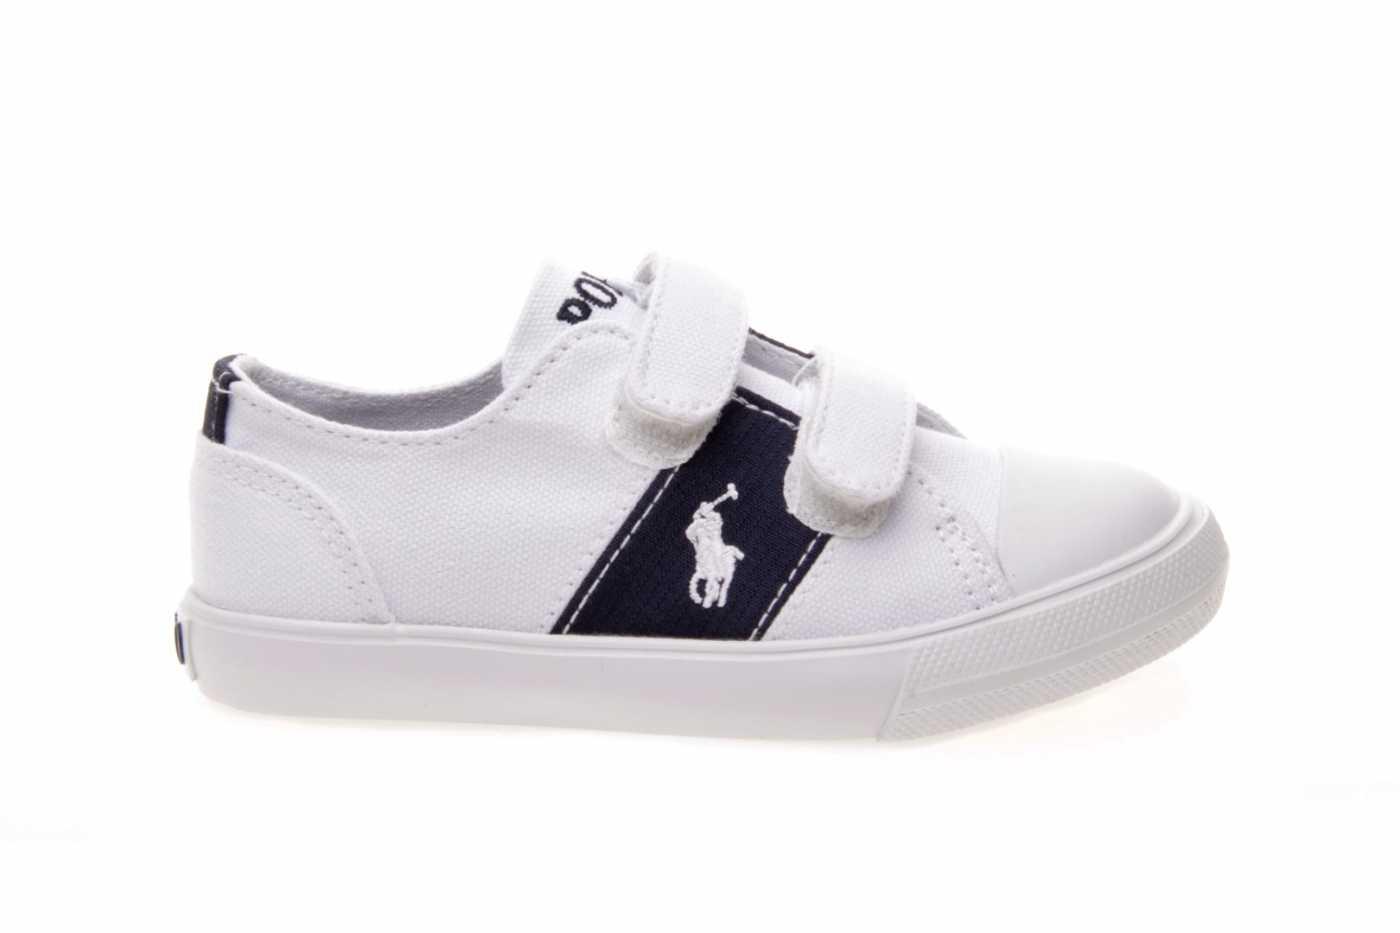 5ae680134 Comprar zapato tipo JOVEN NIÑO estilo BLUCHER COLOR BLANCO LONA ...